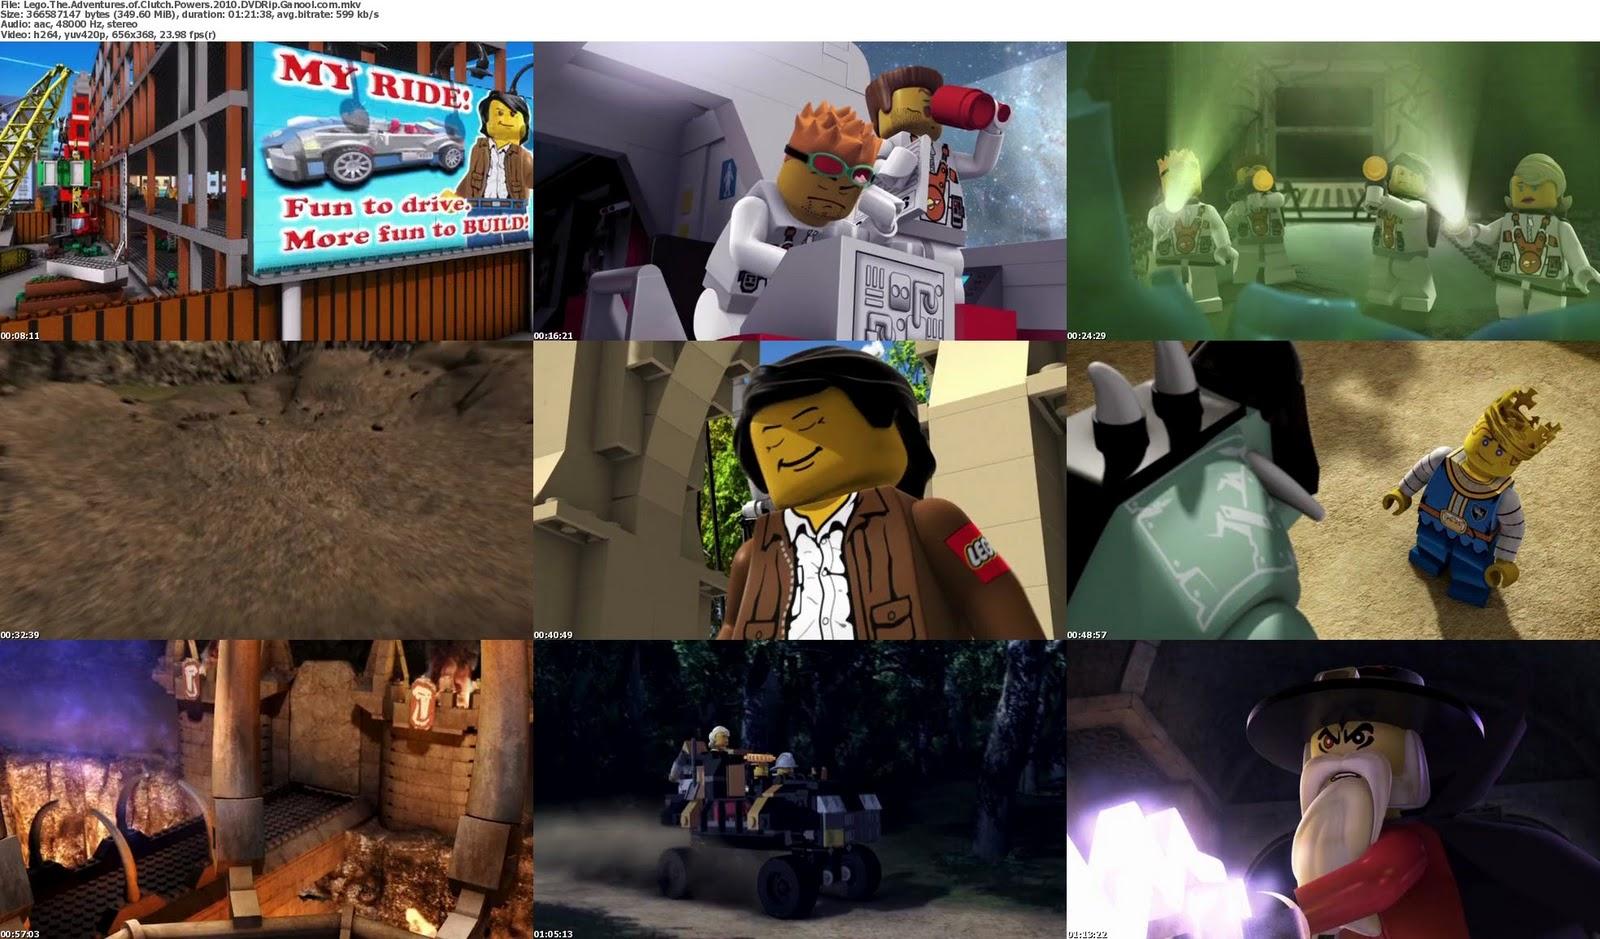 http://2.bp.blogspot.com/-HFAiTlyqaMw/TZHZEMnAdjI/AAAAAAAAE2g/E1T1uMbaNCo/s1600/Lego+The+Adventures+of+Clutch+Powers+Screen.jpg